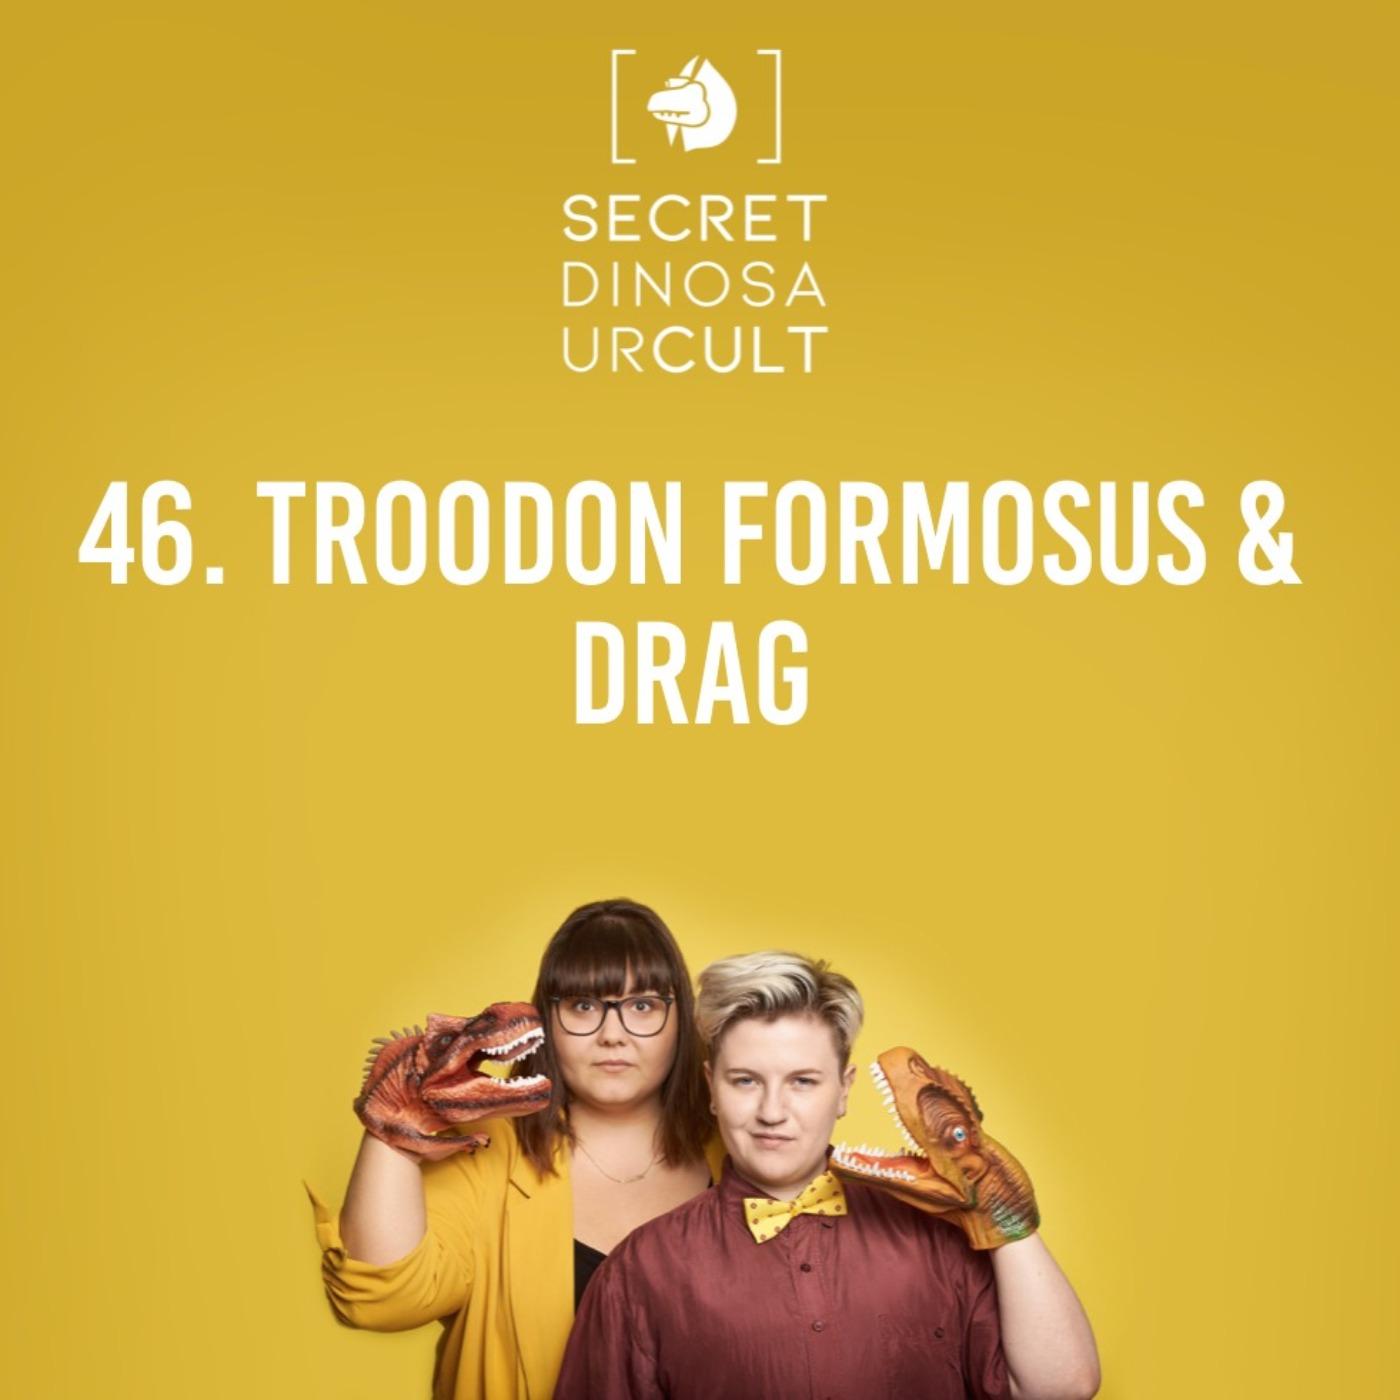 Troodon Formosus & Drag